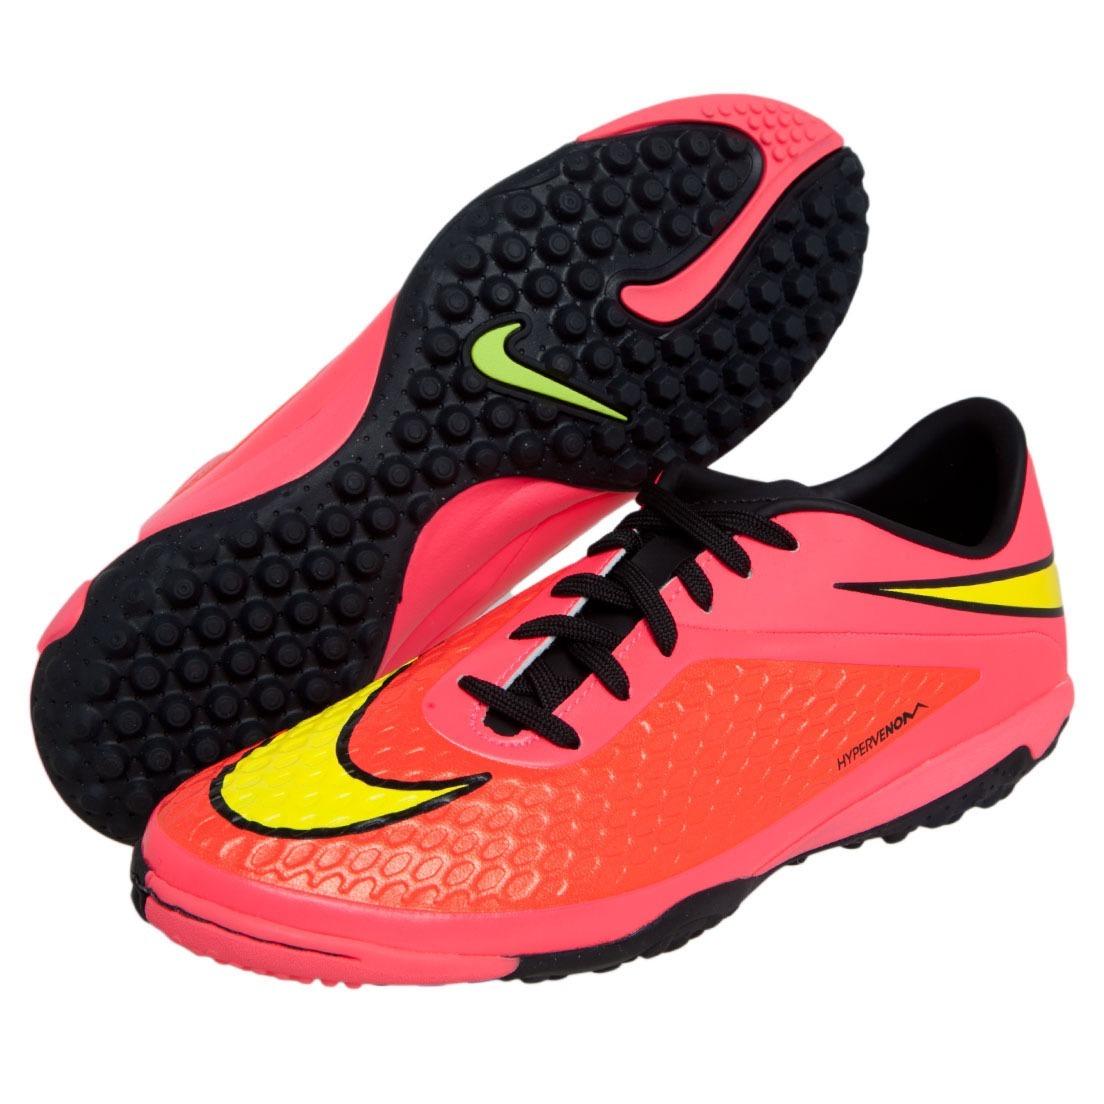 4bd0807b5610e Chuteira Nike Society Hypervenom Phelon Tf Original 599846 - R  219 ...